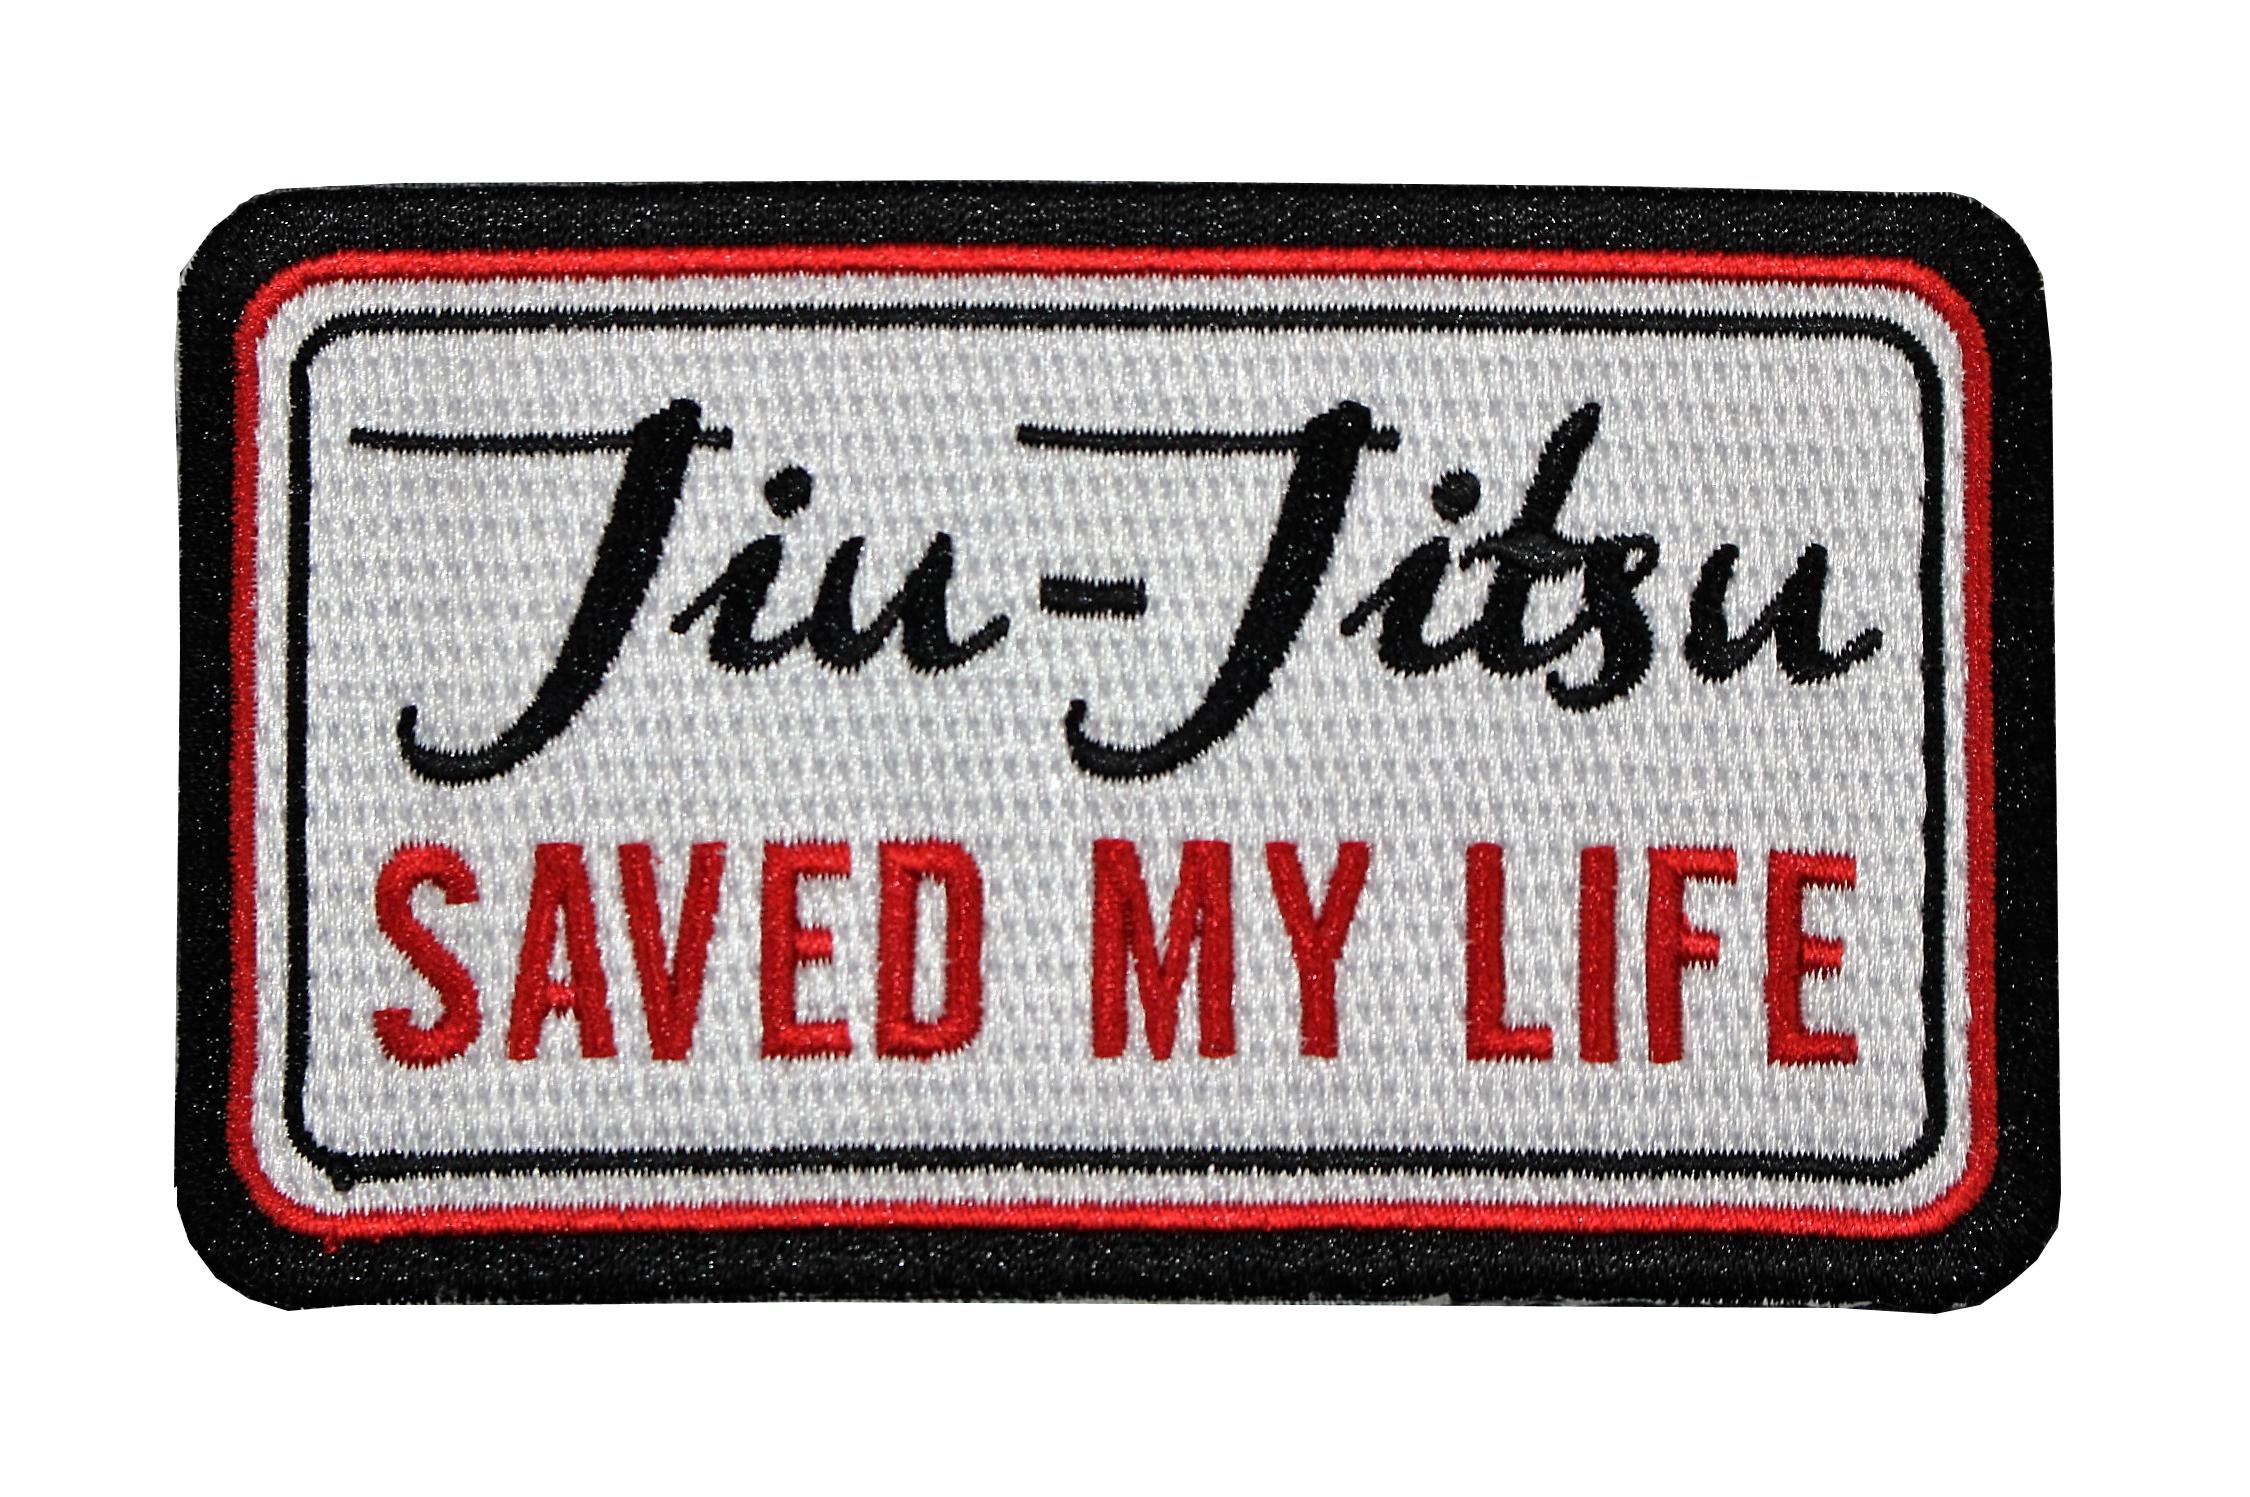 Bjj Jiu Jitsu Gi Patches Jiu Jitsu Saved My Life Gi Patch